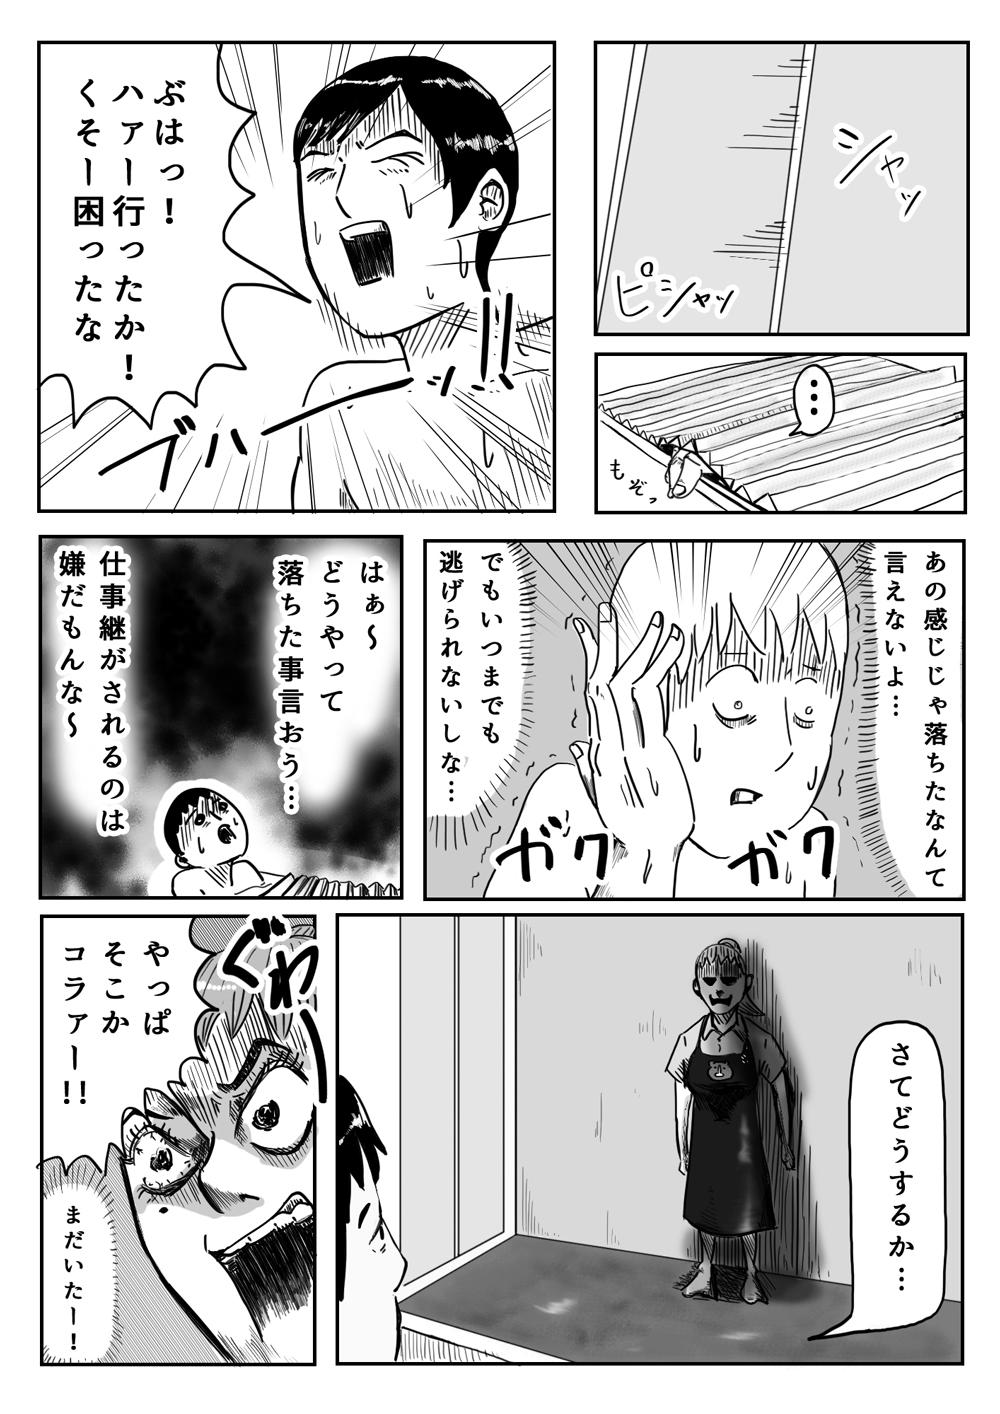 arnolds-hasegawa-003-3